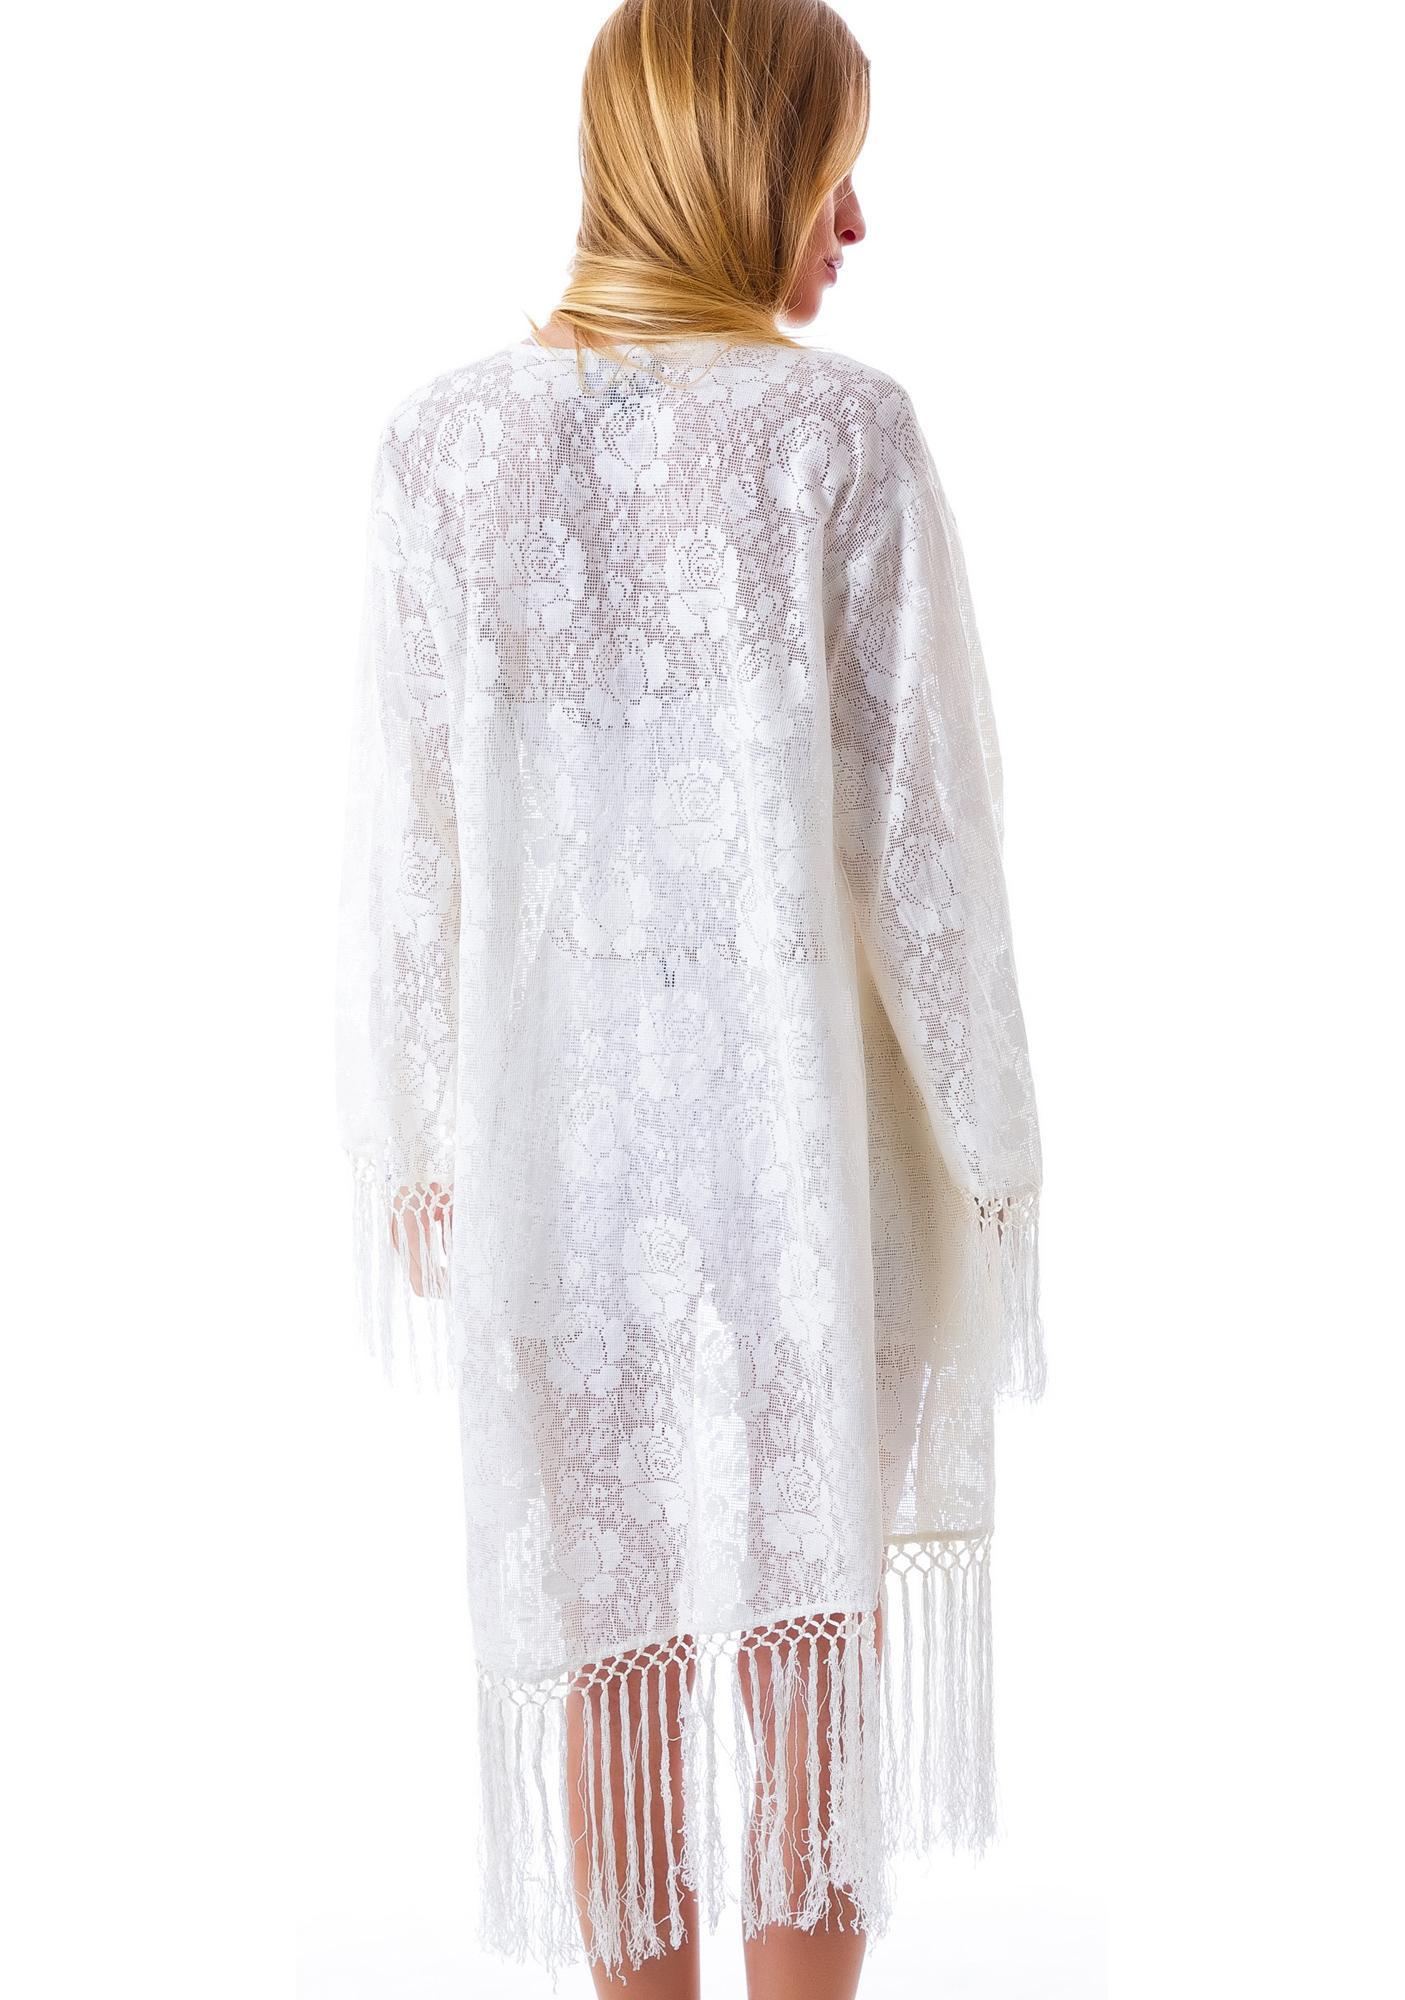 Mink Pink Summer Lace Kimono